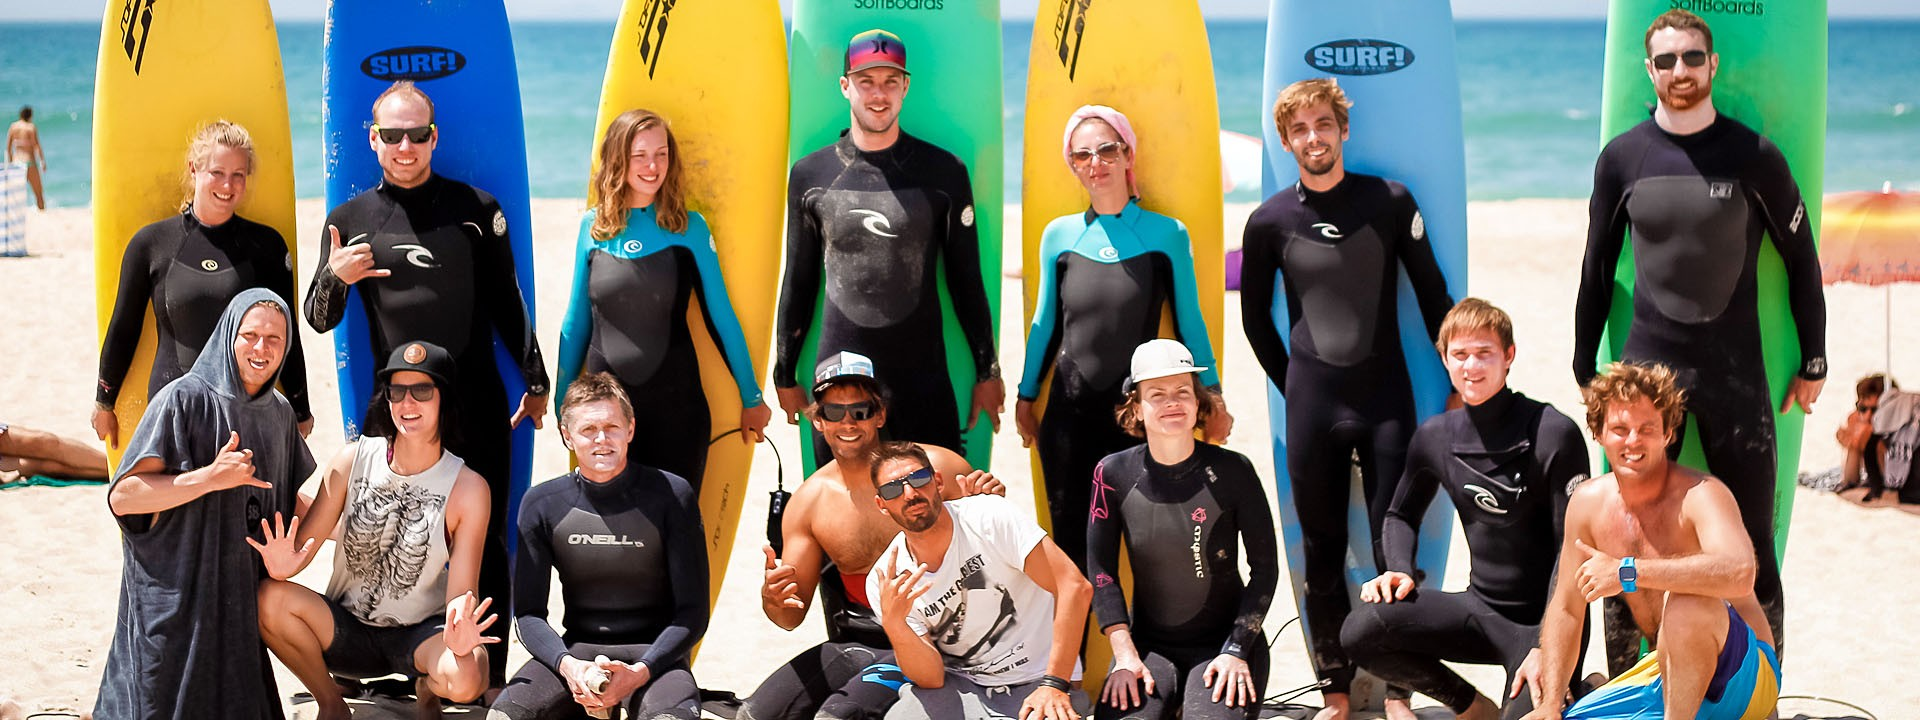 Surfergruppe am Strand